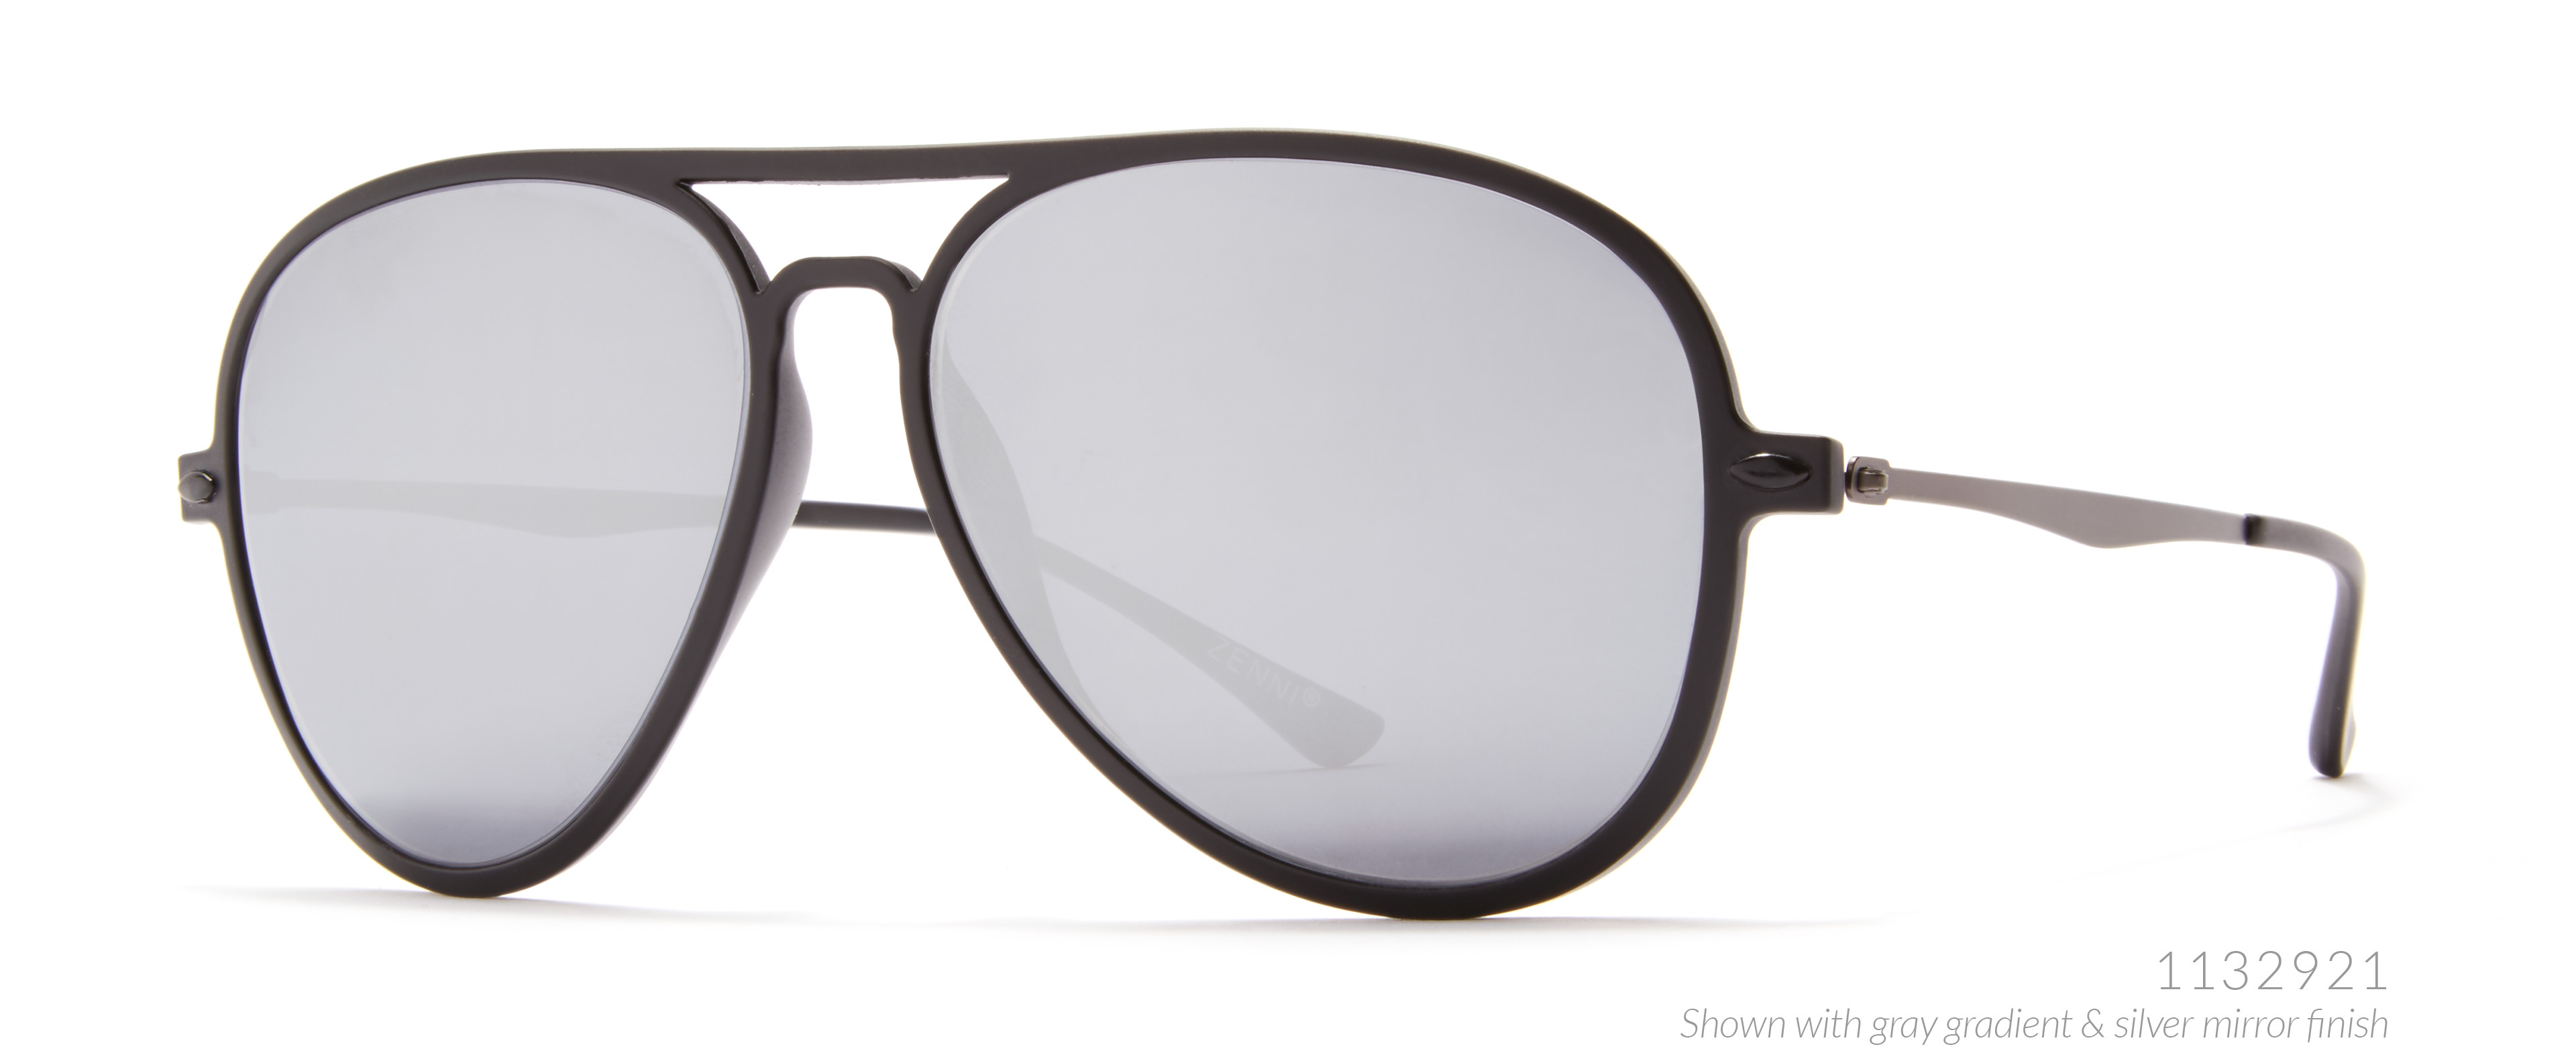 Bride & Groom Sunglasses for Your Outdoor Wedding | Zenni Optical